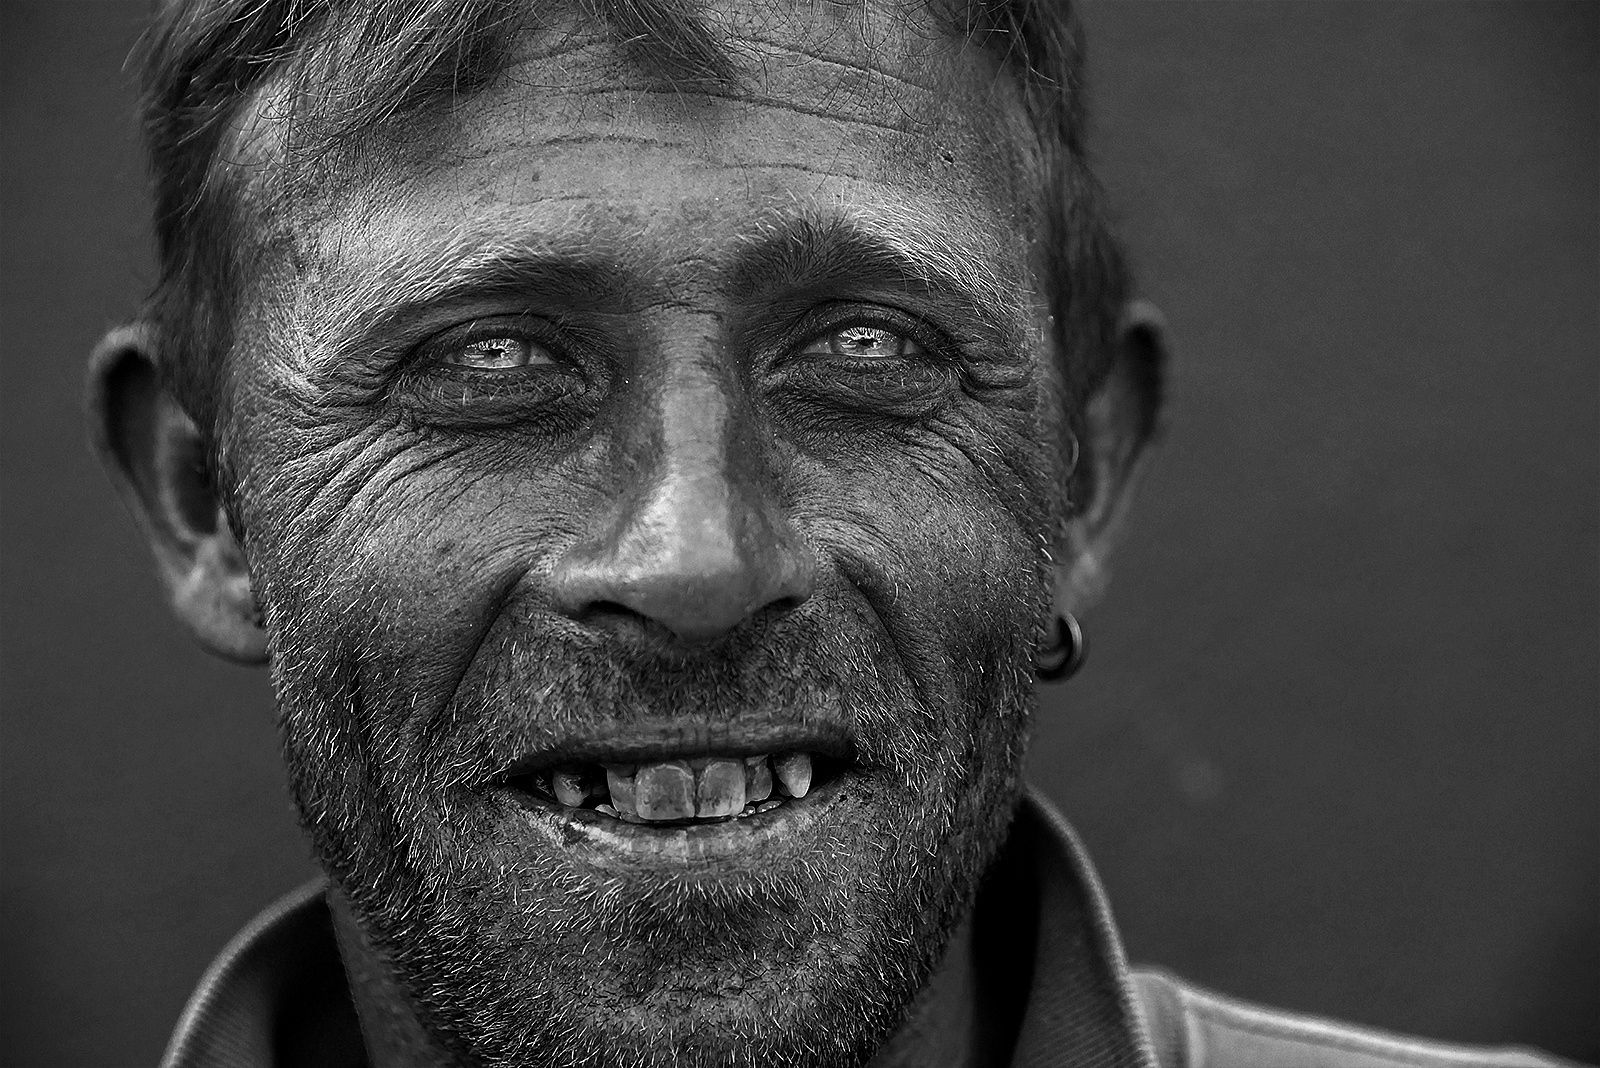 The Fisherman by Luca La Veglia on 500px